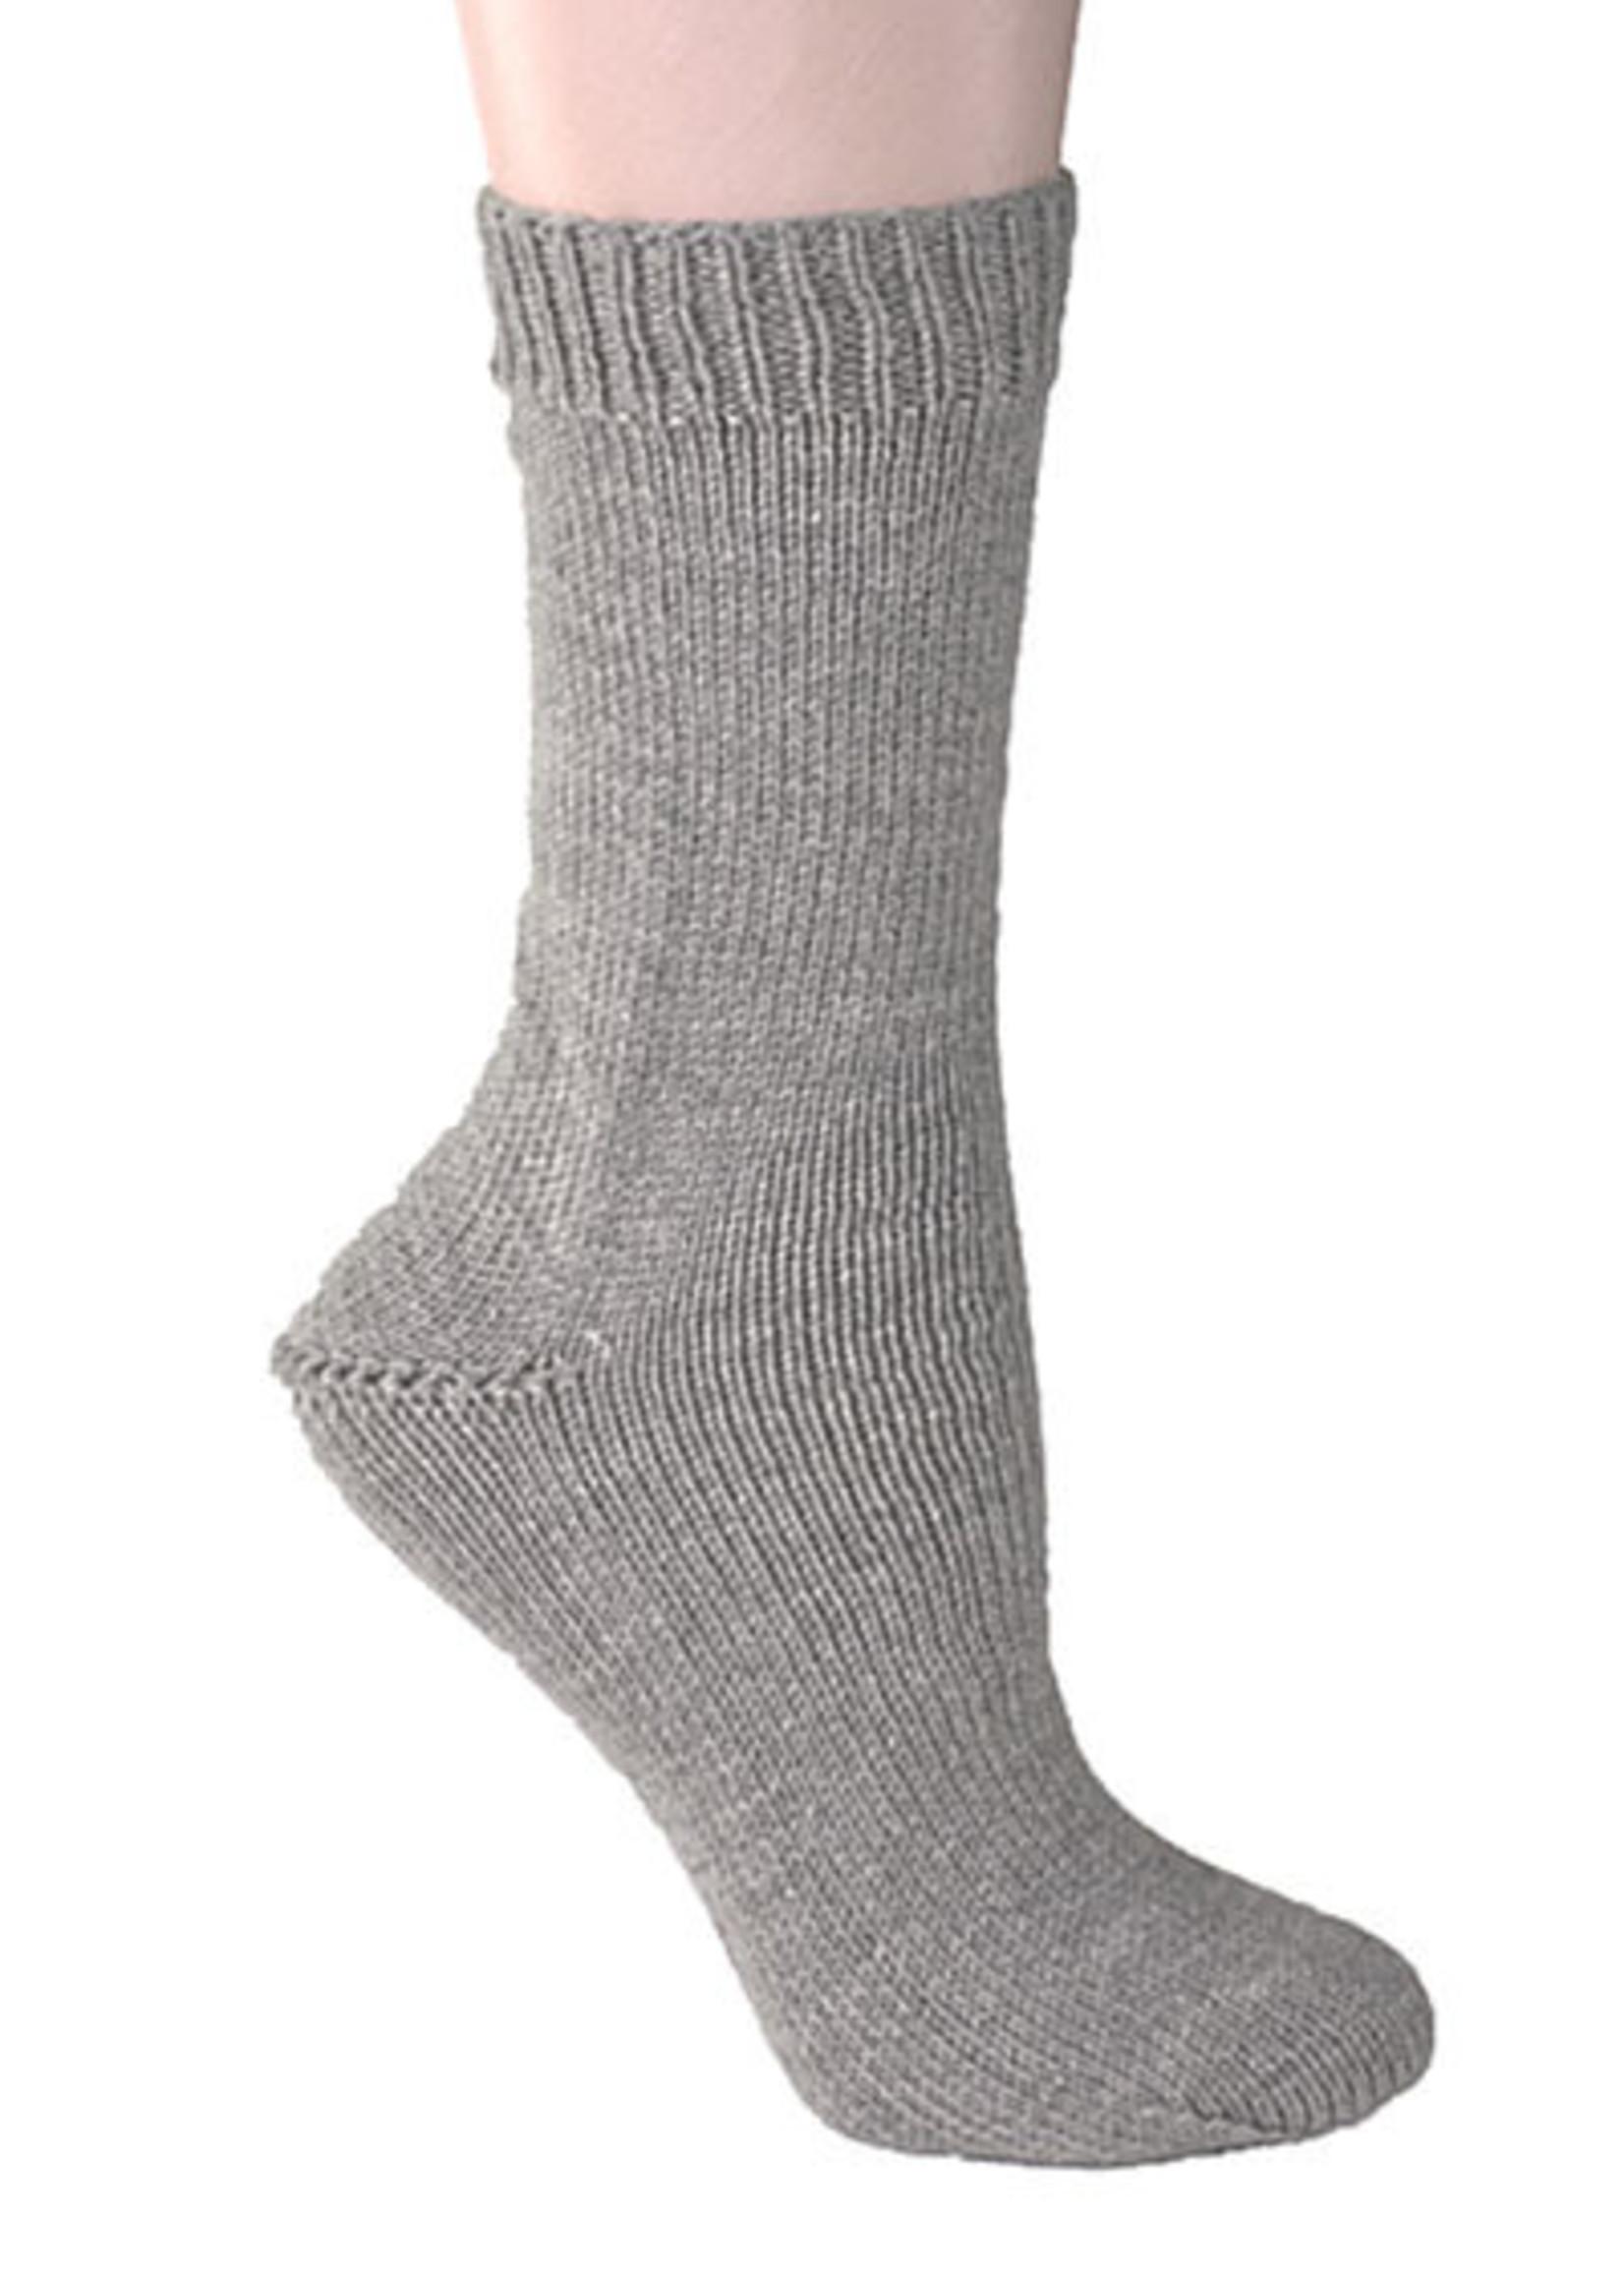 Berroco Berroco Comfort Sock Yarn #1770 Ash Grey